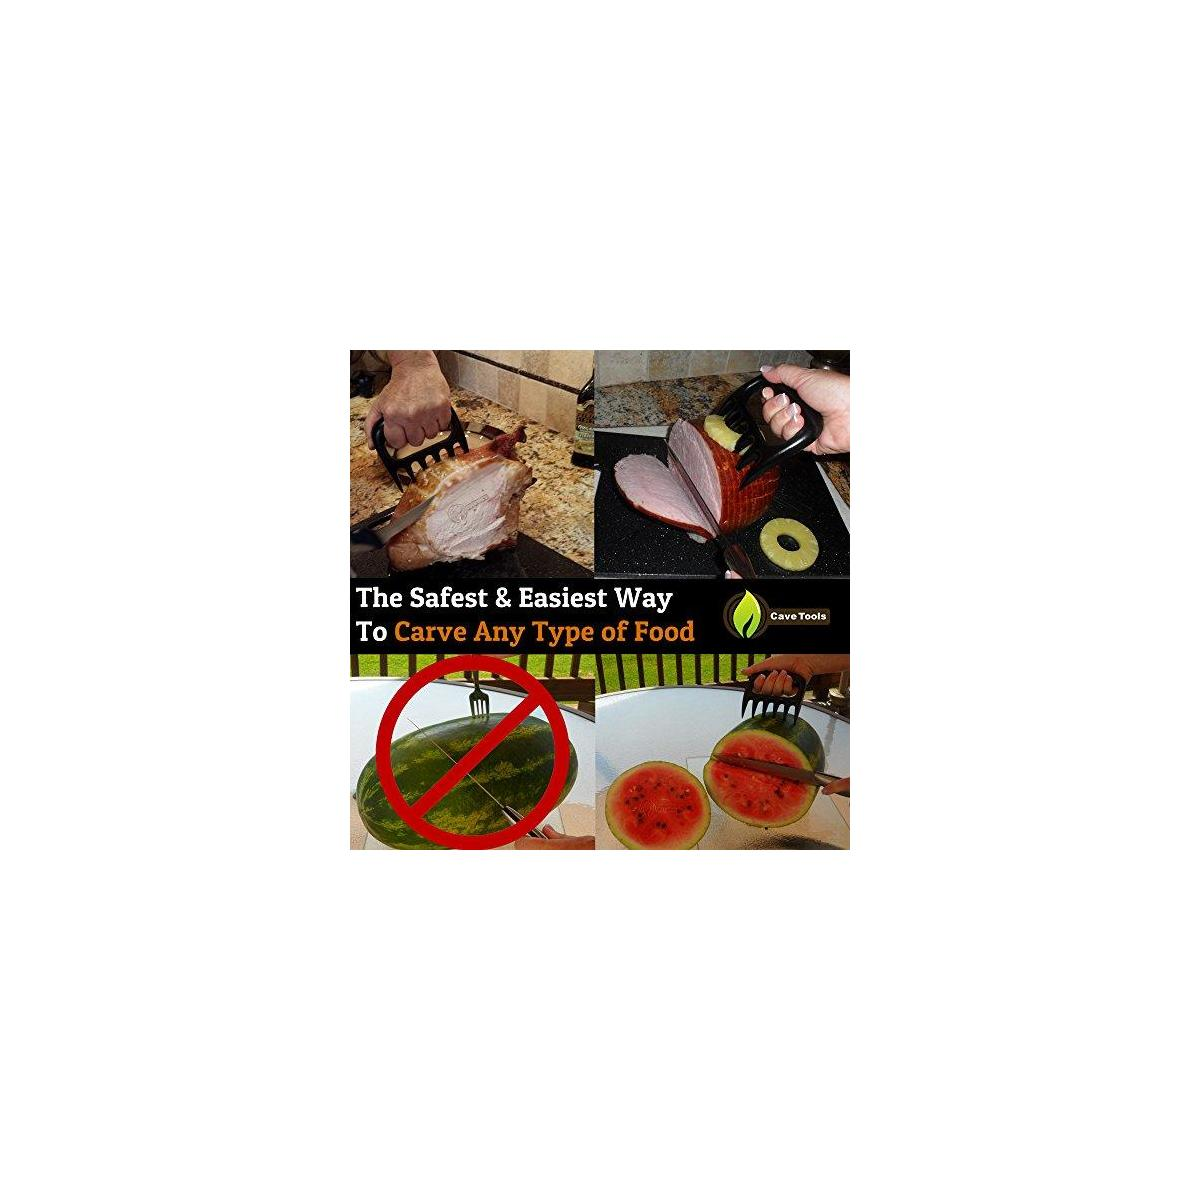 Vegetable Basket + Pulled Pork Shredder Claws - Strongest BBQ Meat Forks - Shredding Handling & Carving Food - Claw Handler Set for Pulling Brisket from Grill Smoker or Slow Cooker - Barbecue Paws